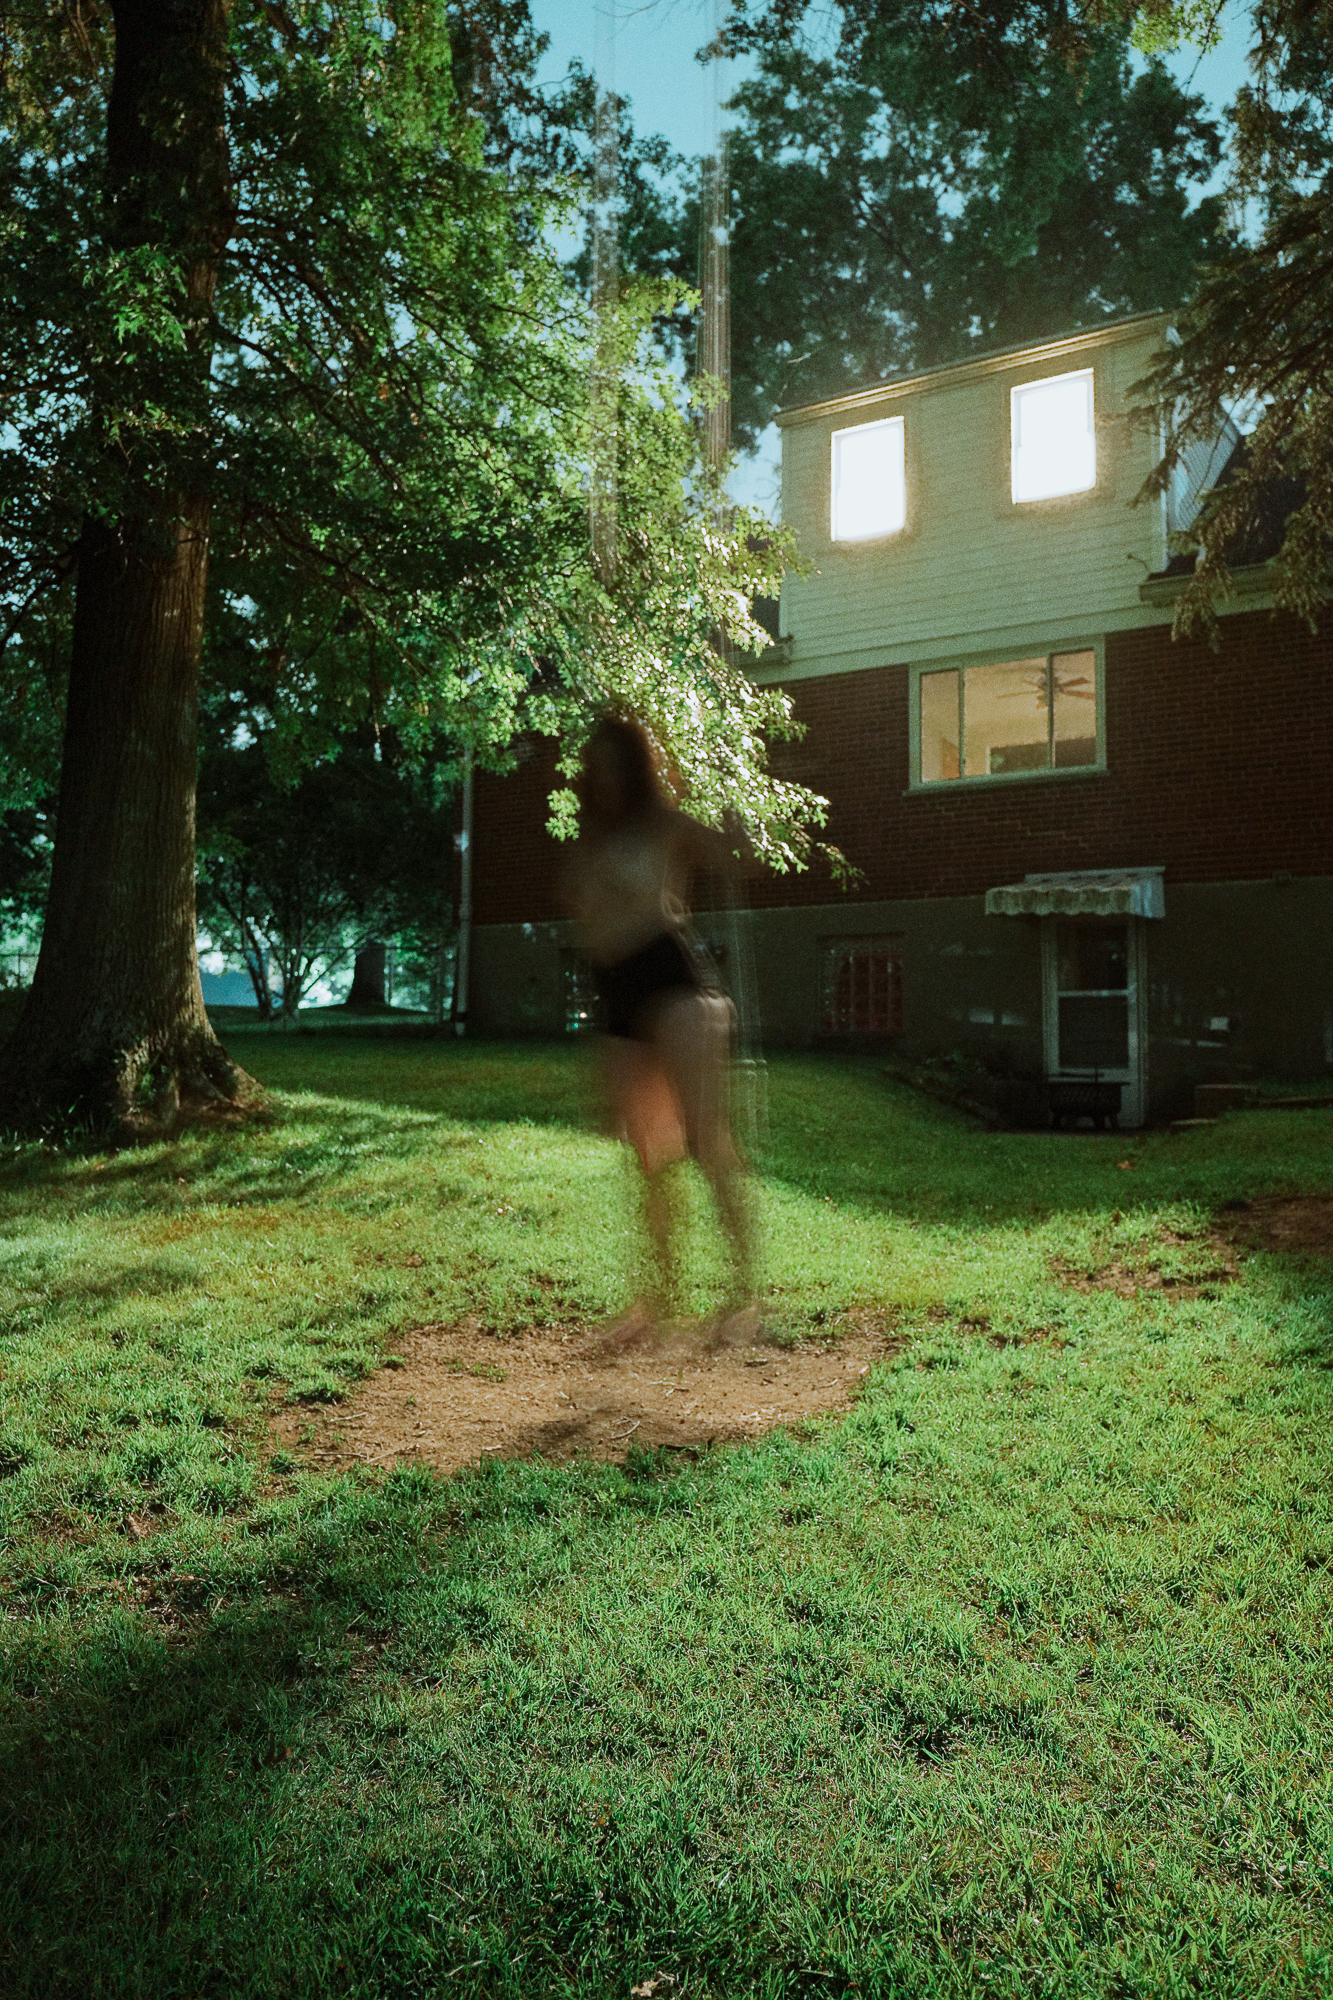 20180813-Hannah-night-outside-X-T2-0010-Edit.jpg